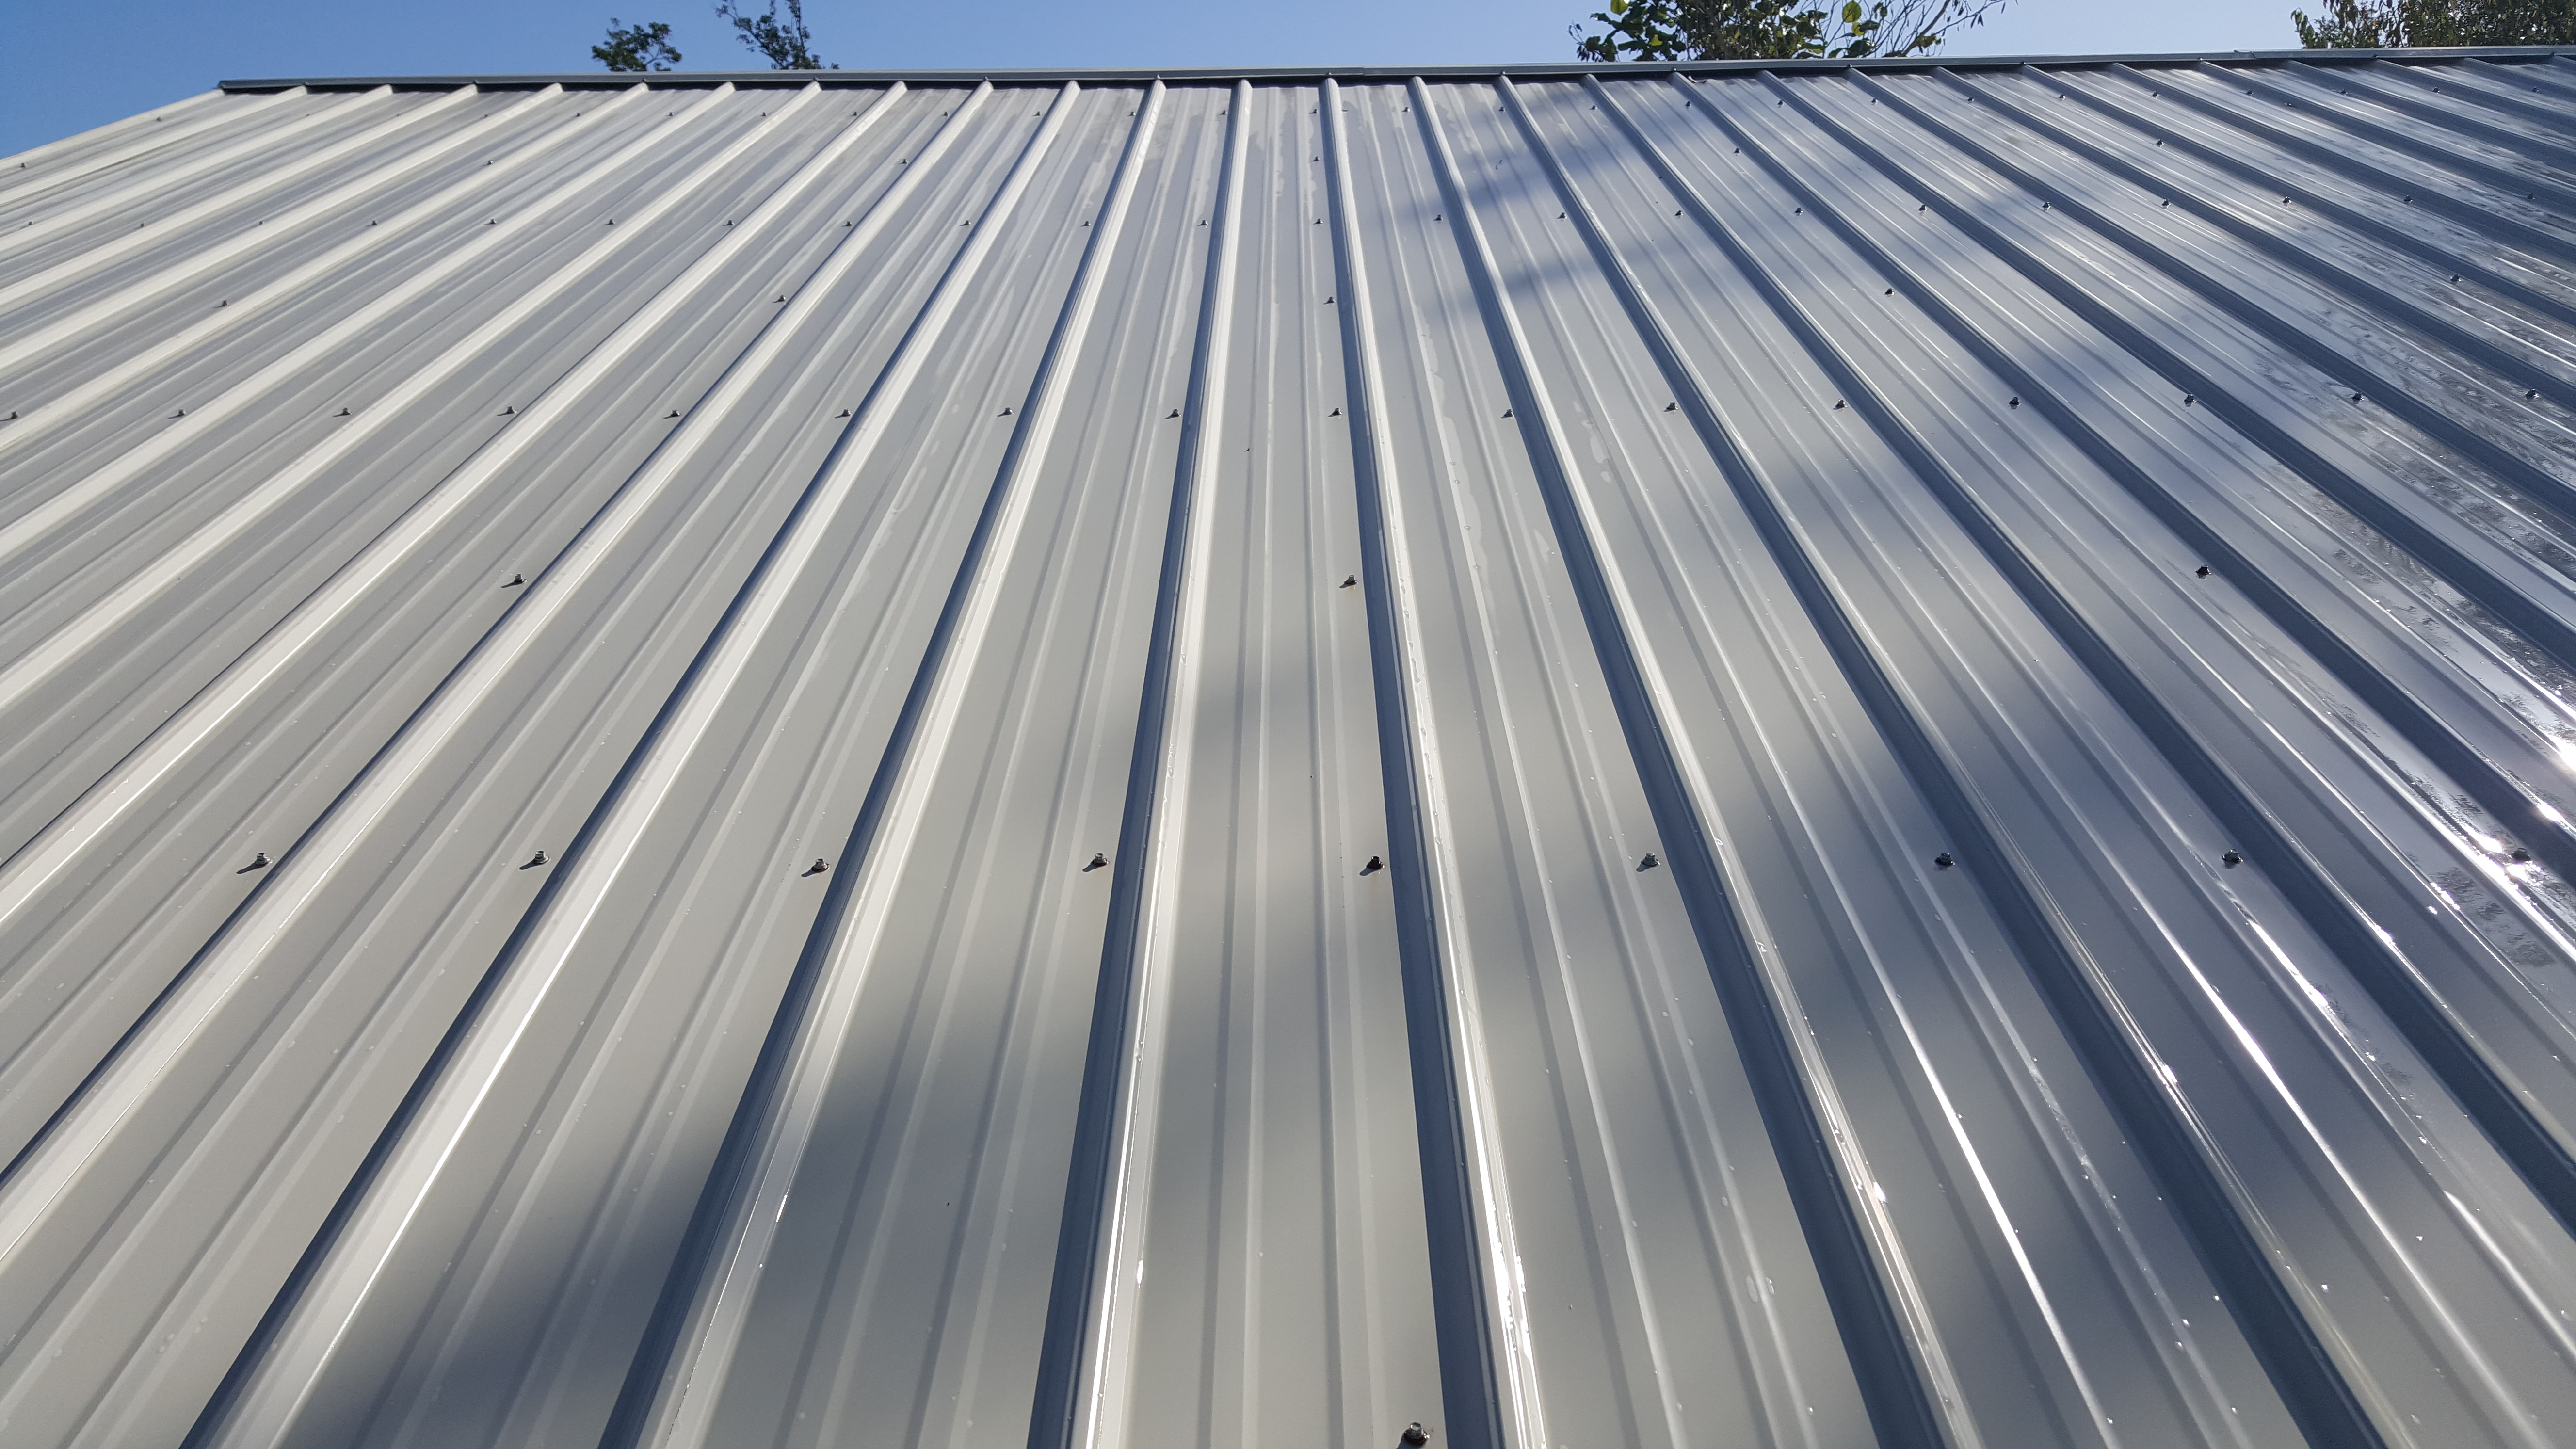 After metal roof wash